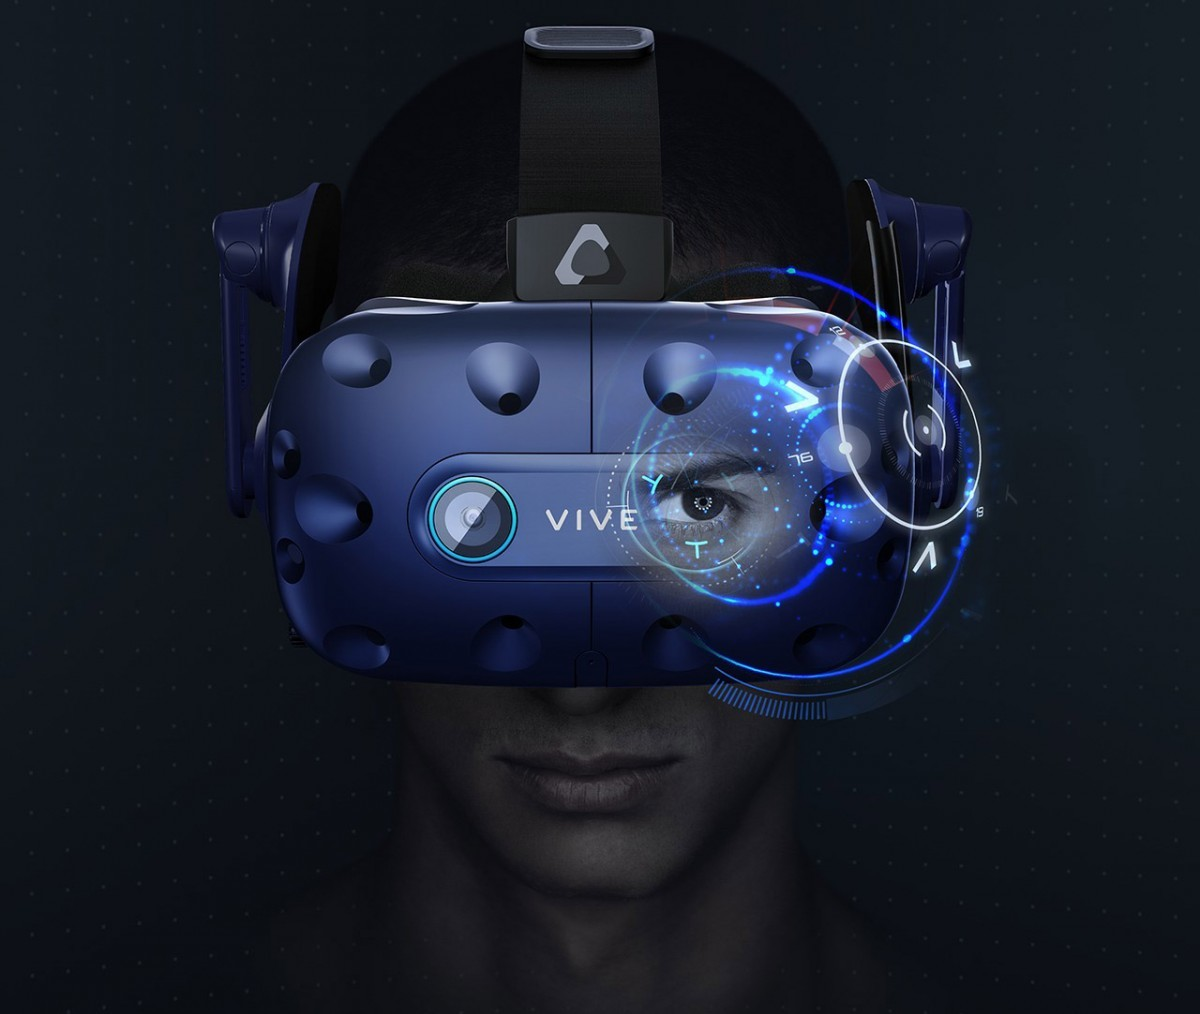 Шлем виртуальной реальности Vive Pro Eye